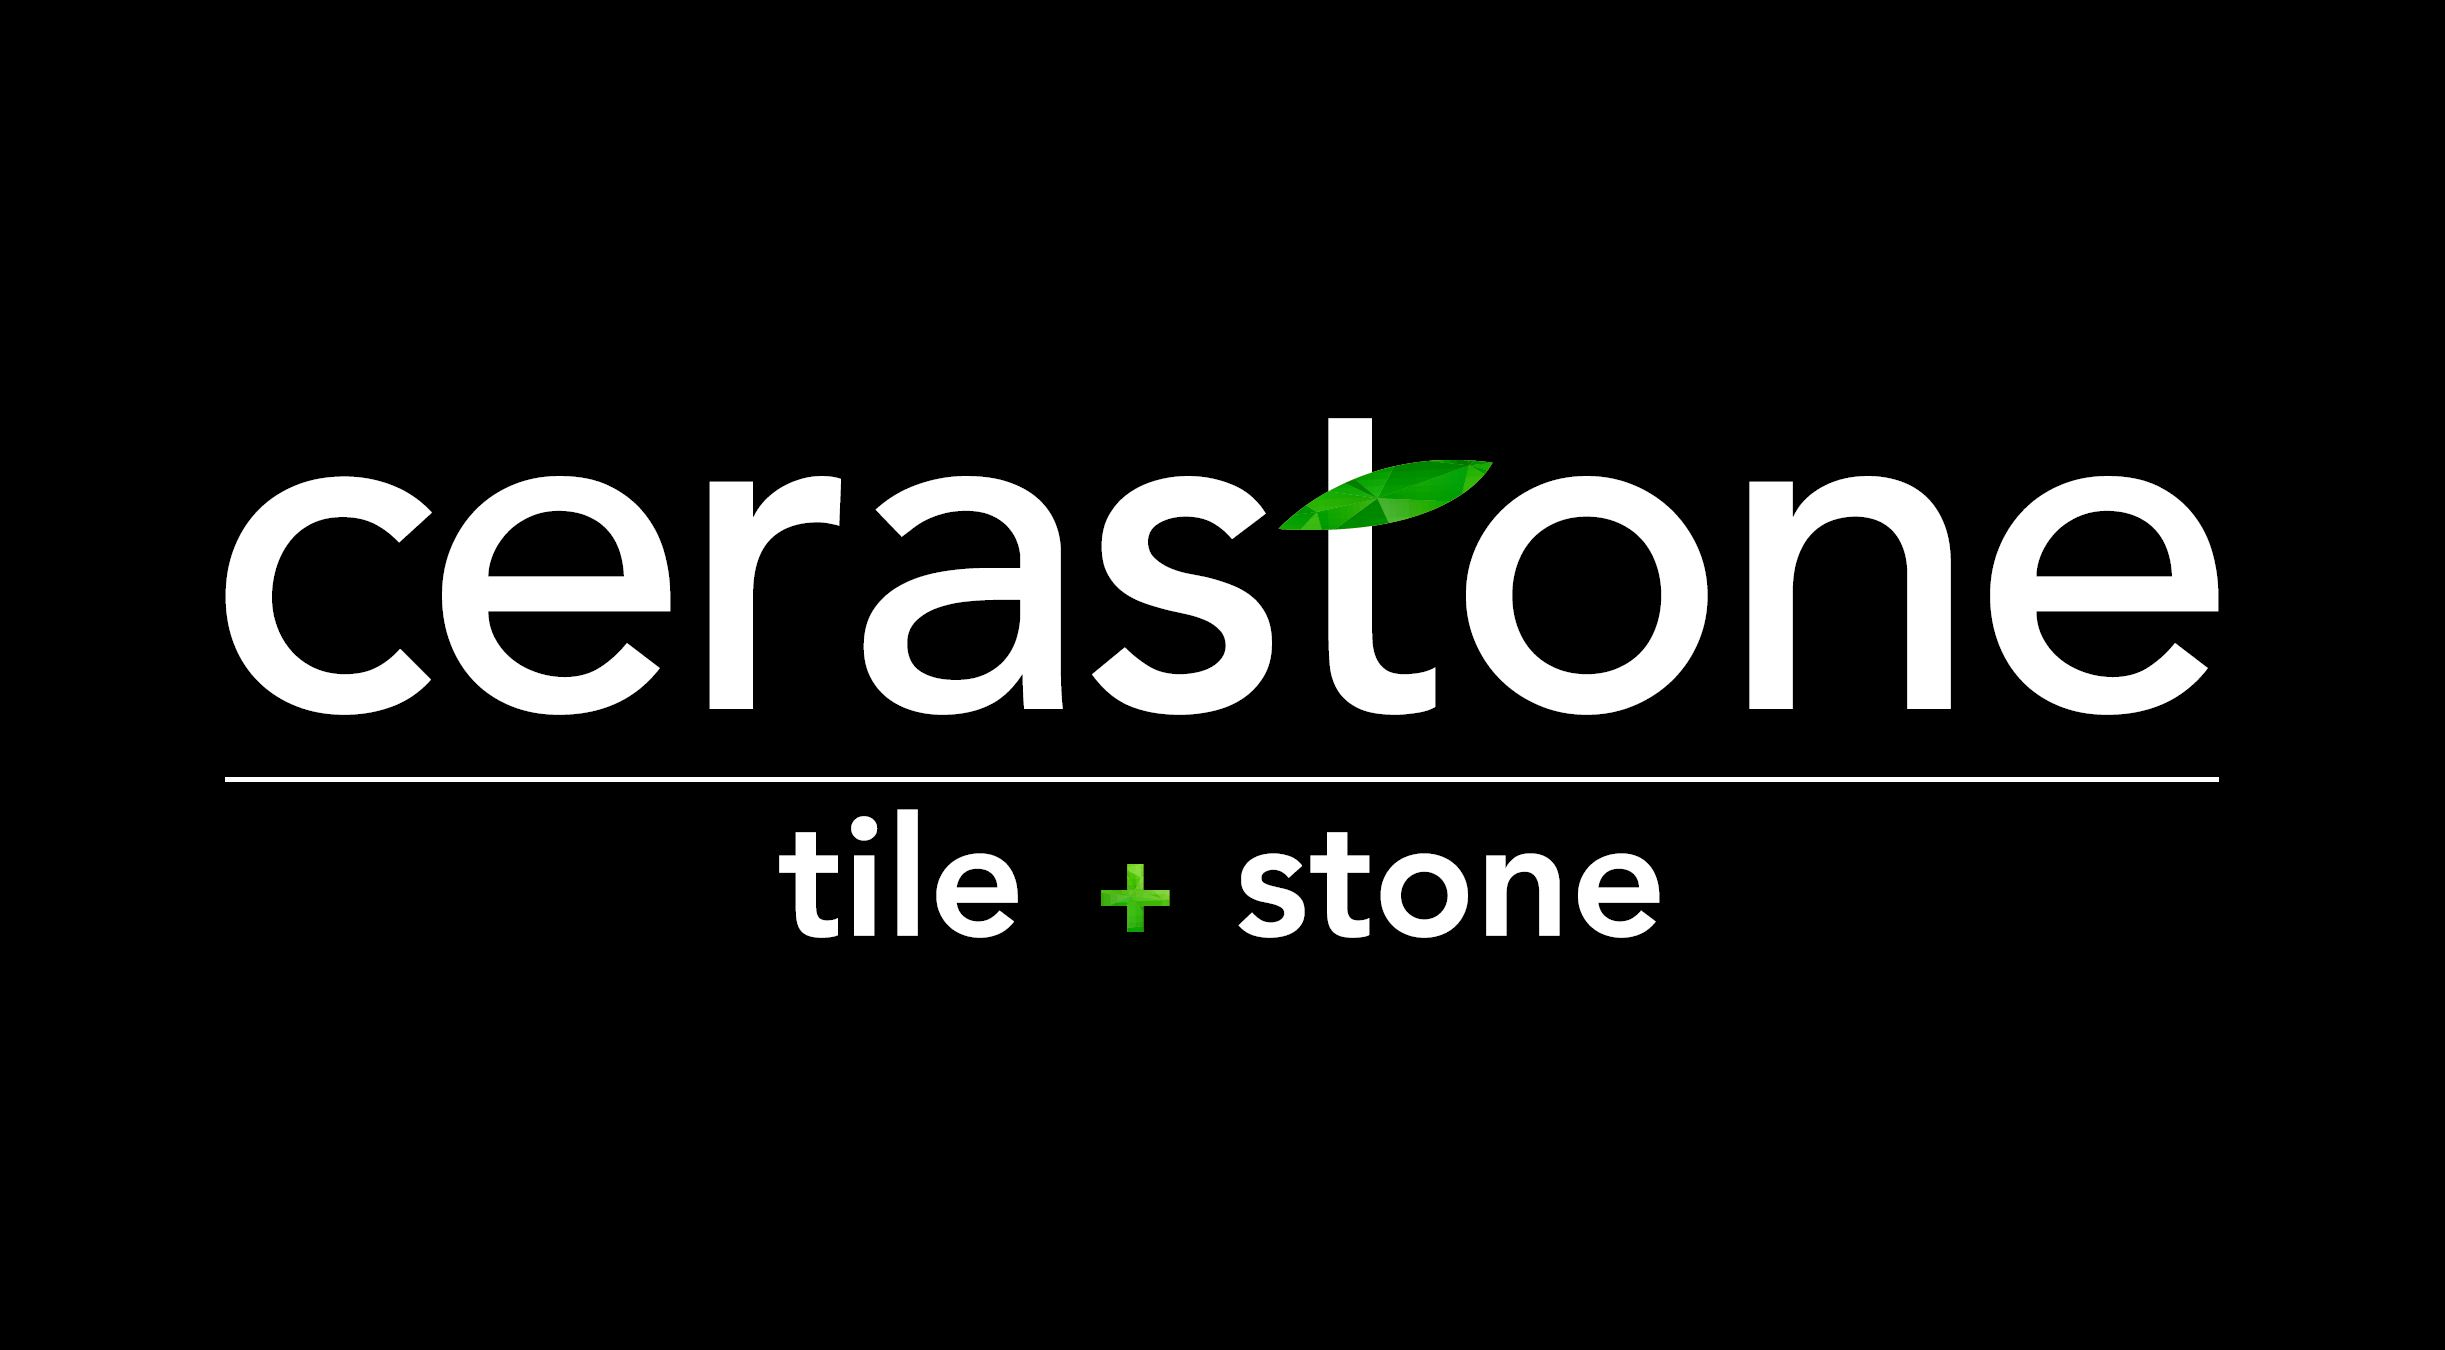 Cerastone logo